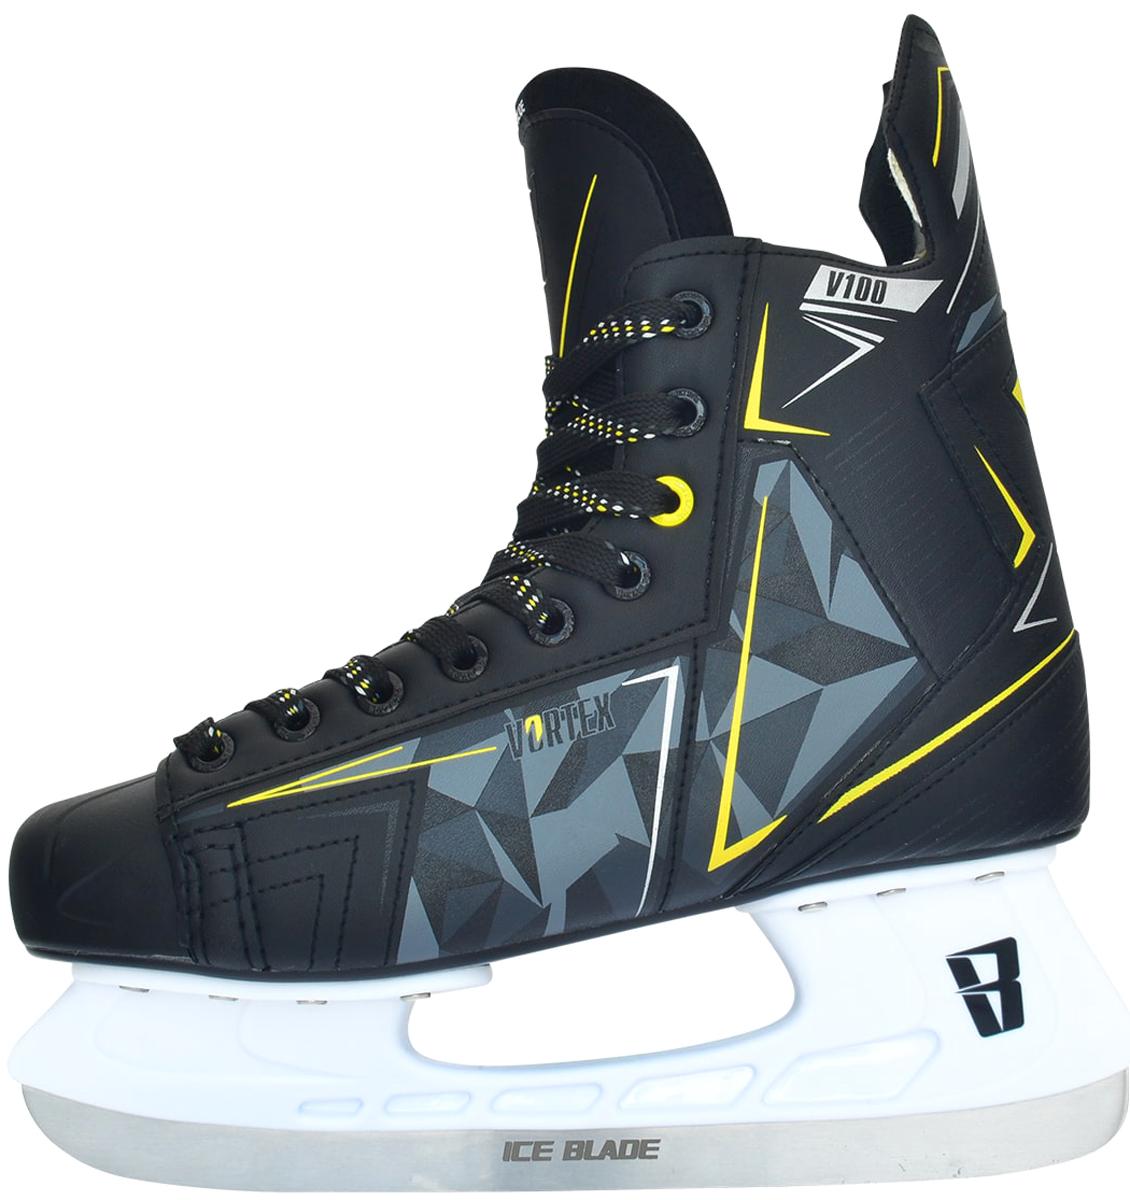 "Коньки хоккейные мужские Ice Blade ""Vortex"", цвет: серый, желтый, белый. Размер 44"